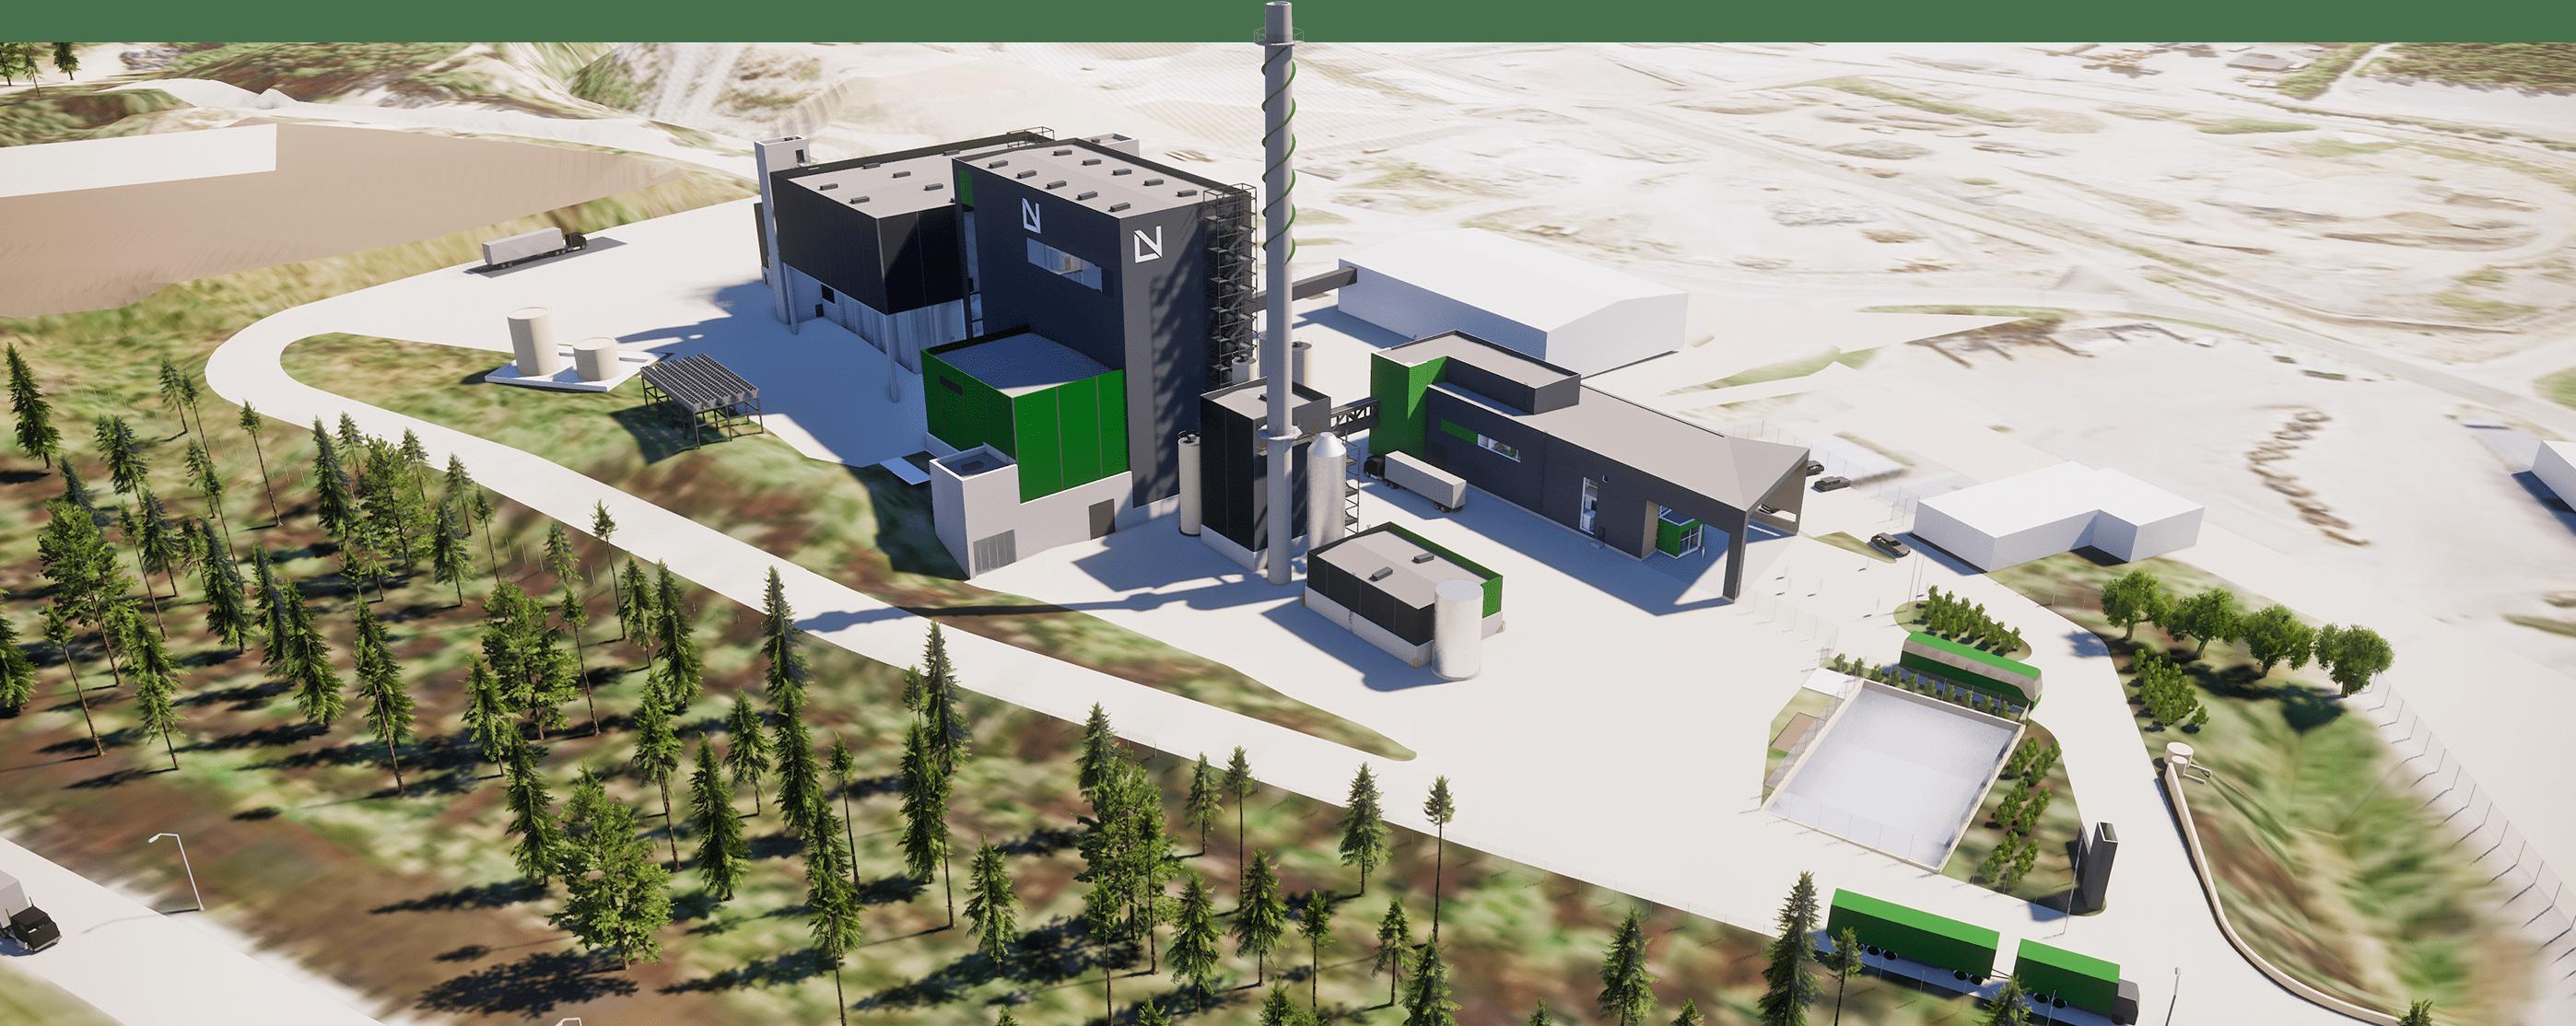 ekokraftverk